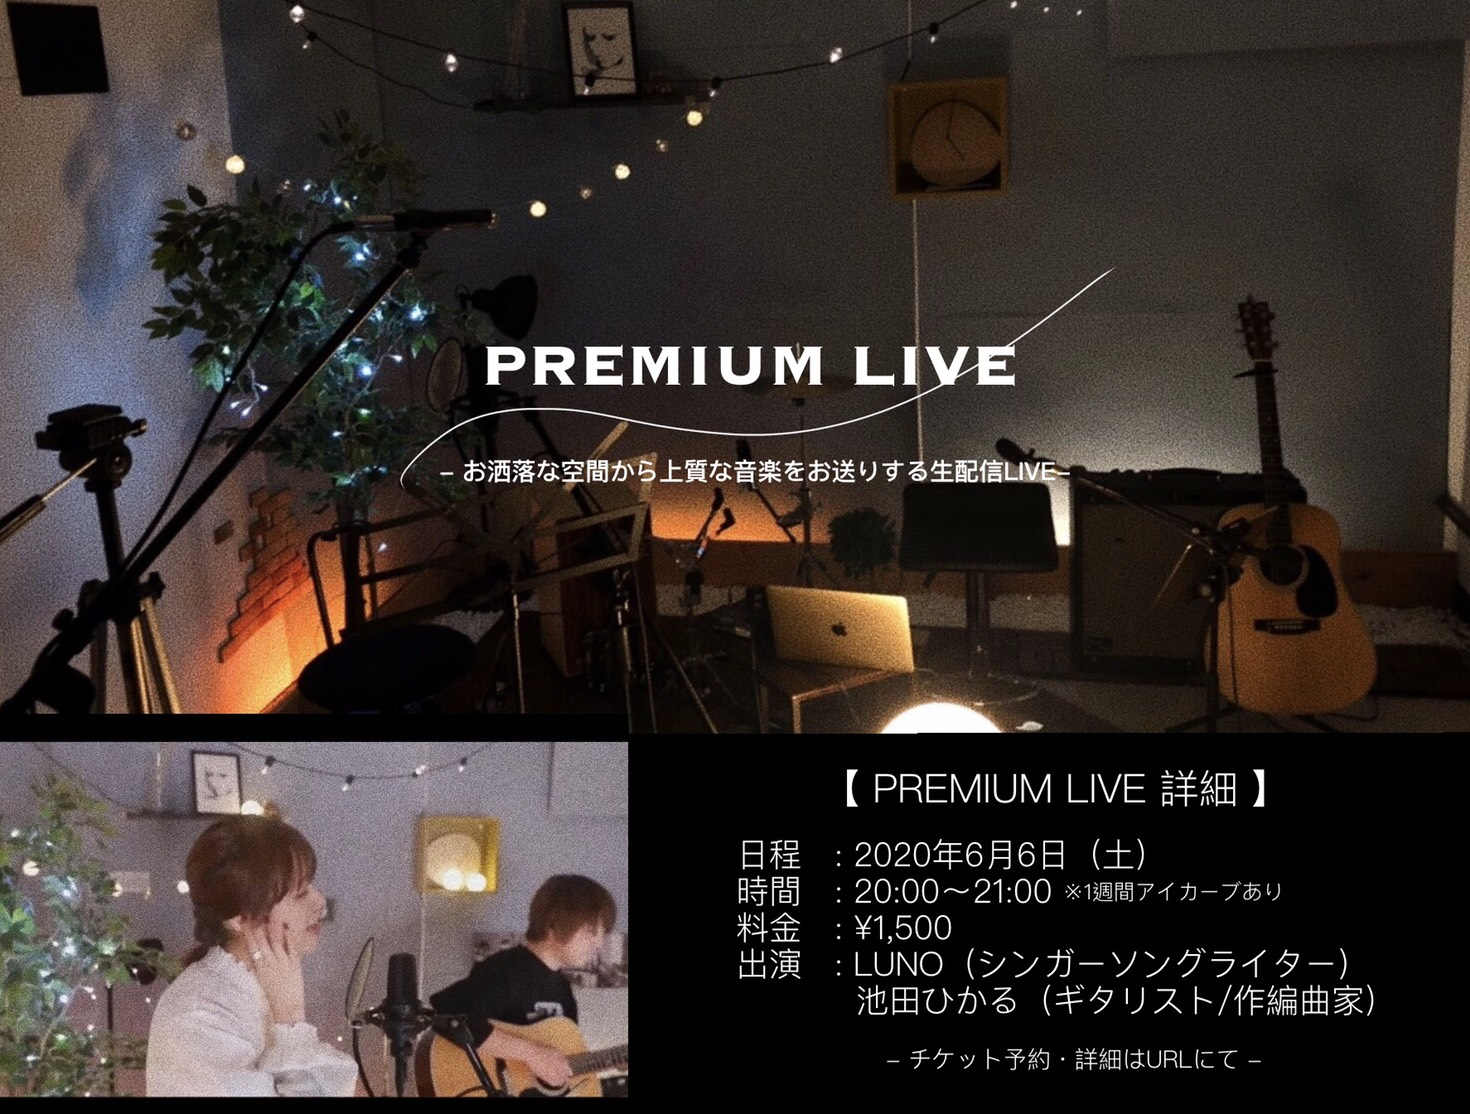 【LIVE】『PREMIUM LIVE × LUNO』by IKmusic